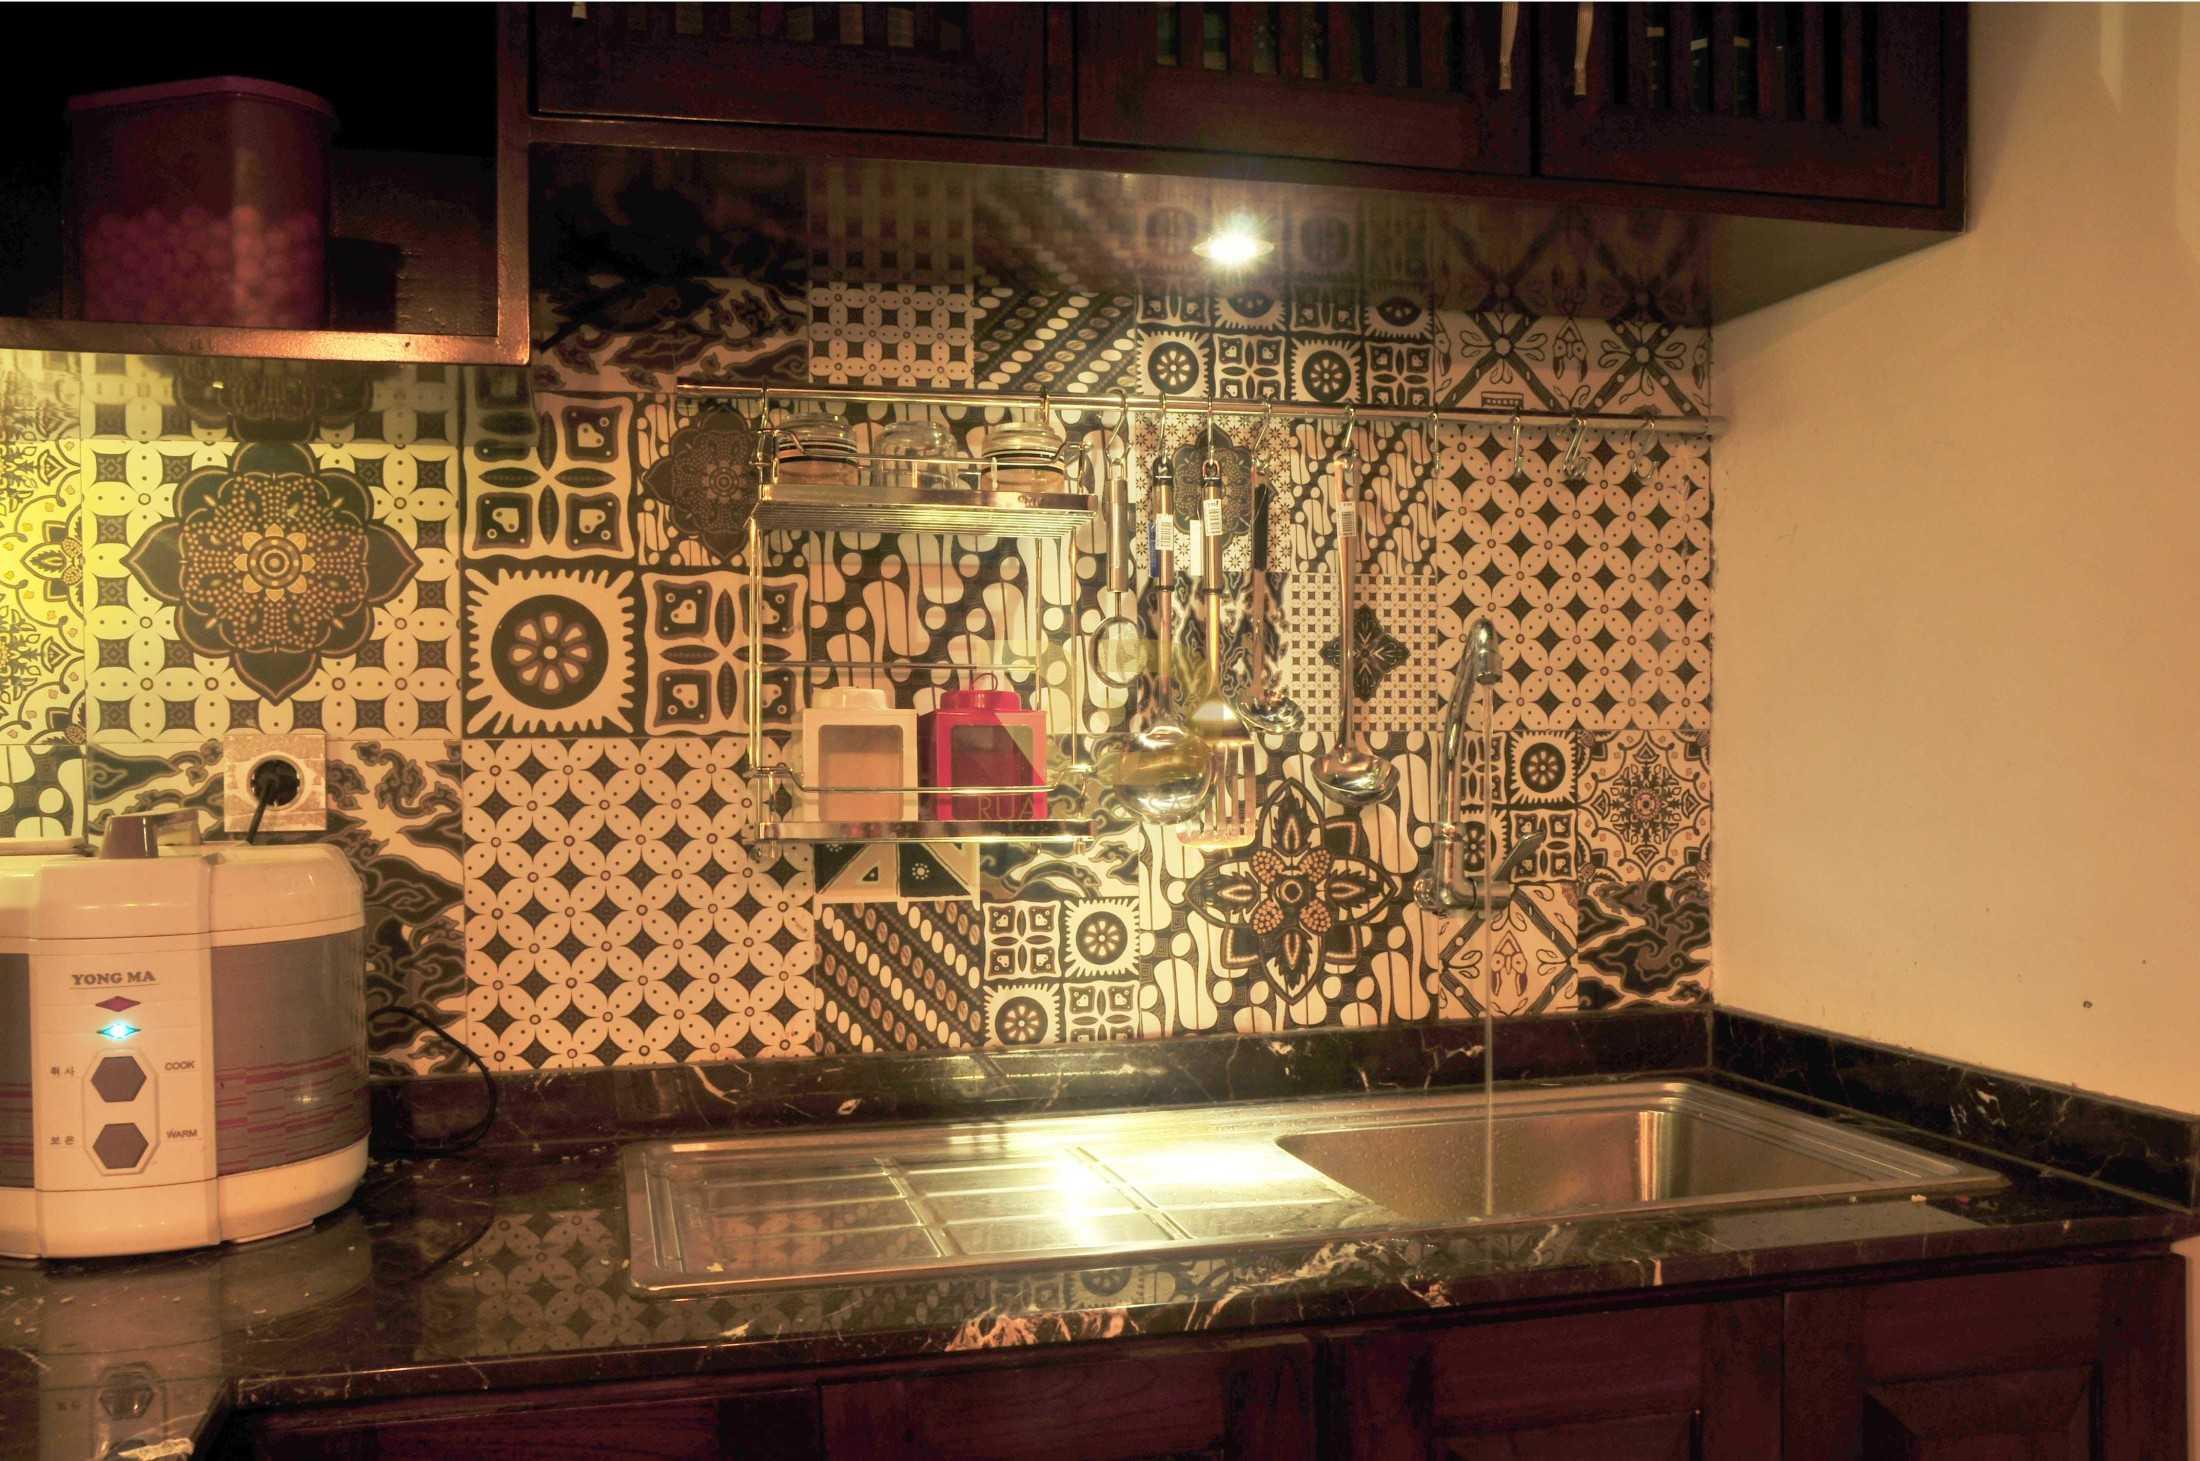 Ruang Desain Solid Wood Kitchen Surabaya, Kota Sby, Jawa Timur, Indonesia Surabaya, Kota Sby, Jawa Timur, Indonesia Ruang-Desain-Solid-Wood-Kitchen  93962